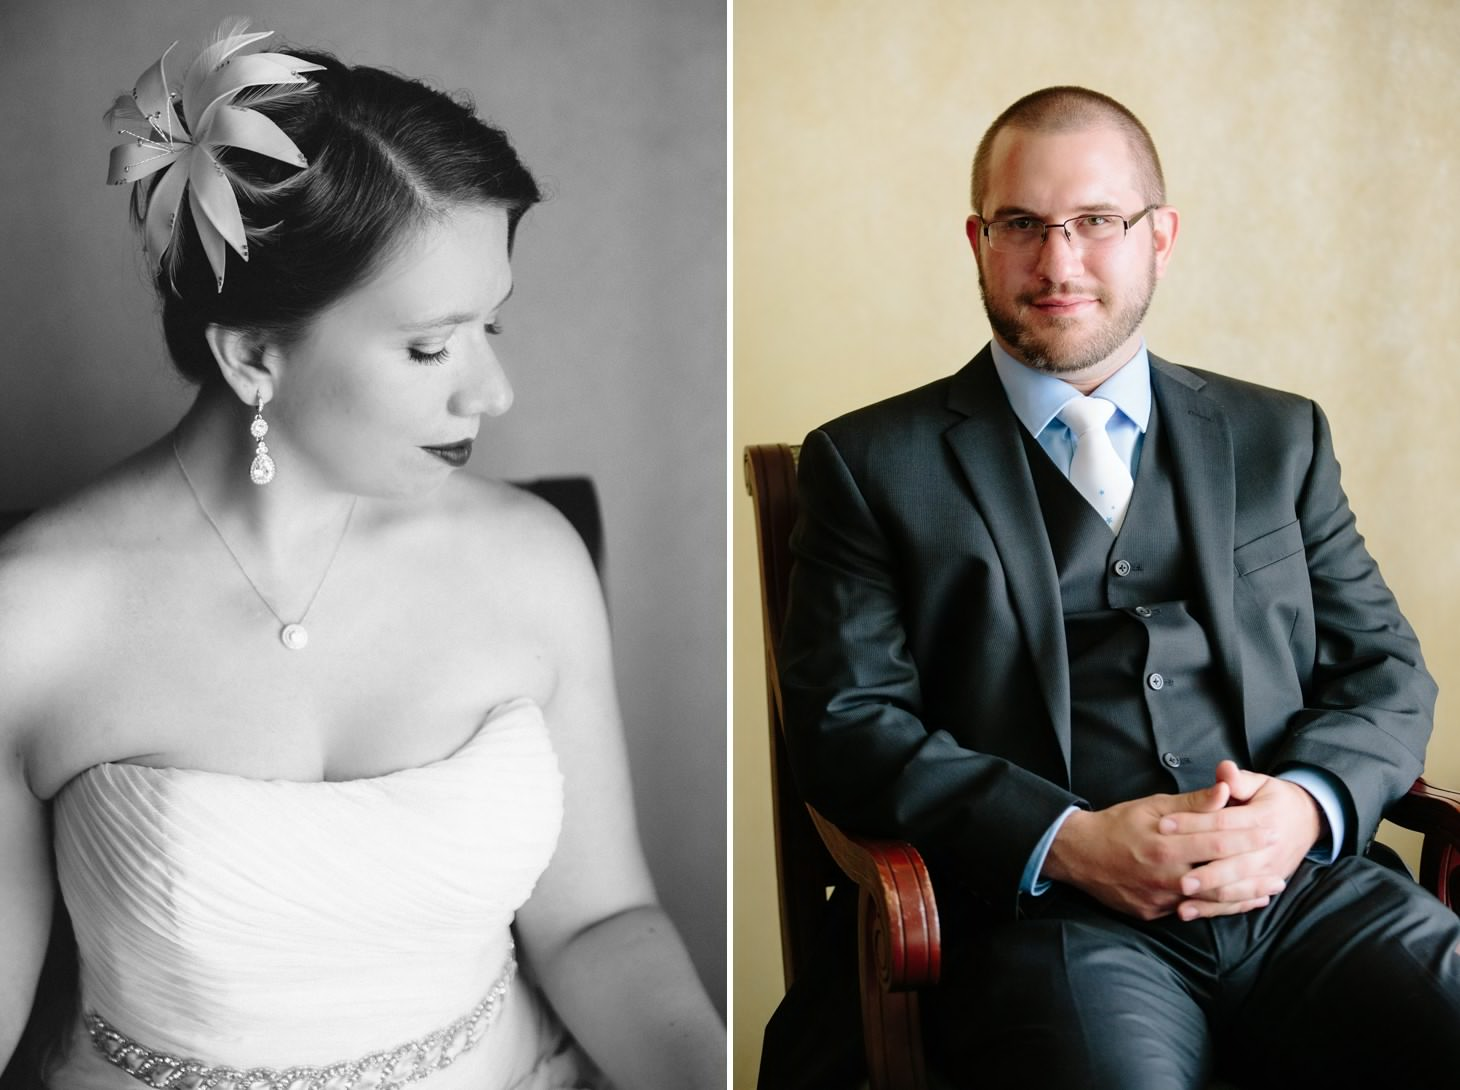 018-nyc-wedding-photographer-nj-nerdy-dr-who-firehouse-wedding-smitten-chickens.jpg